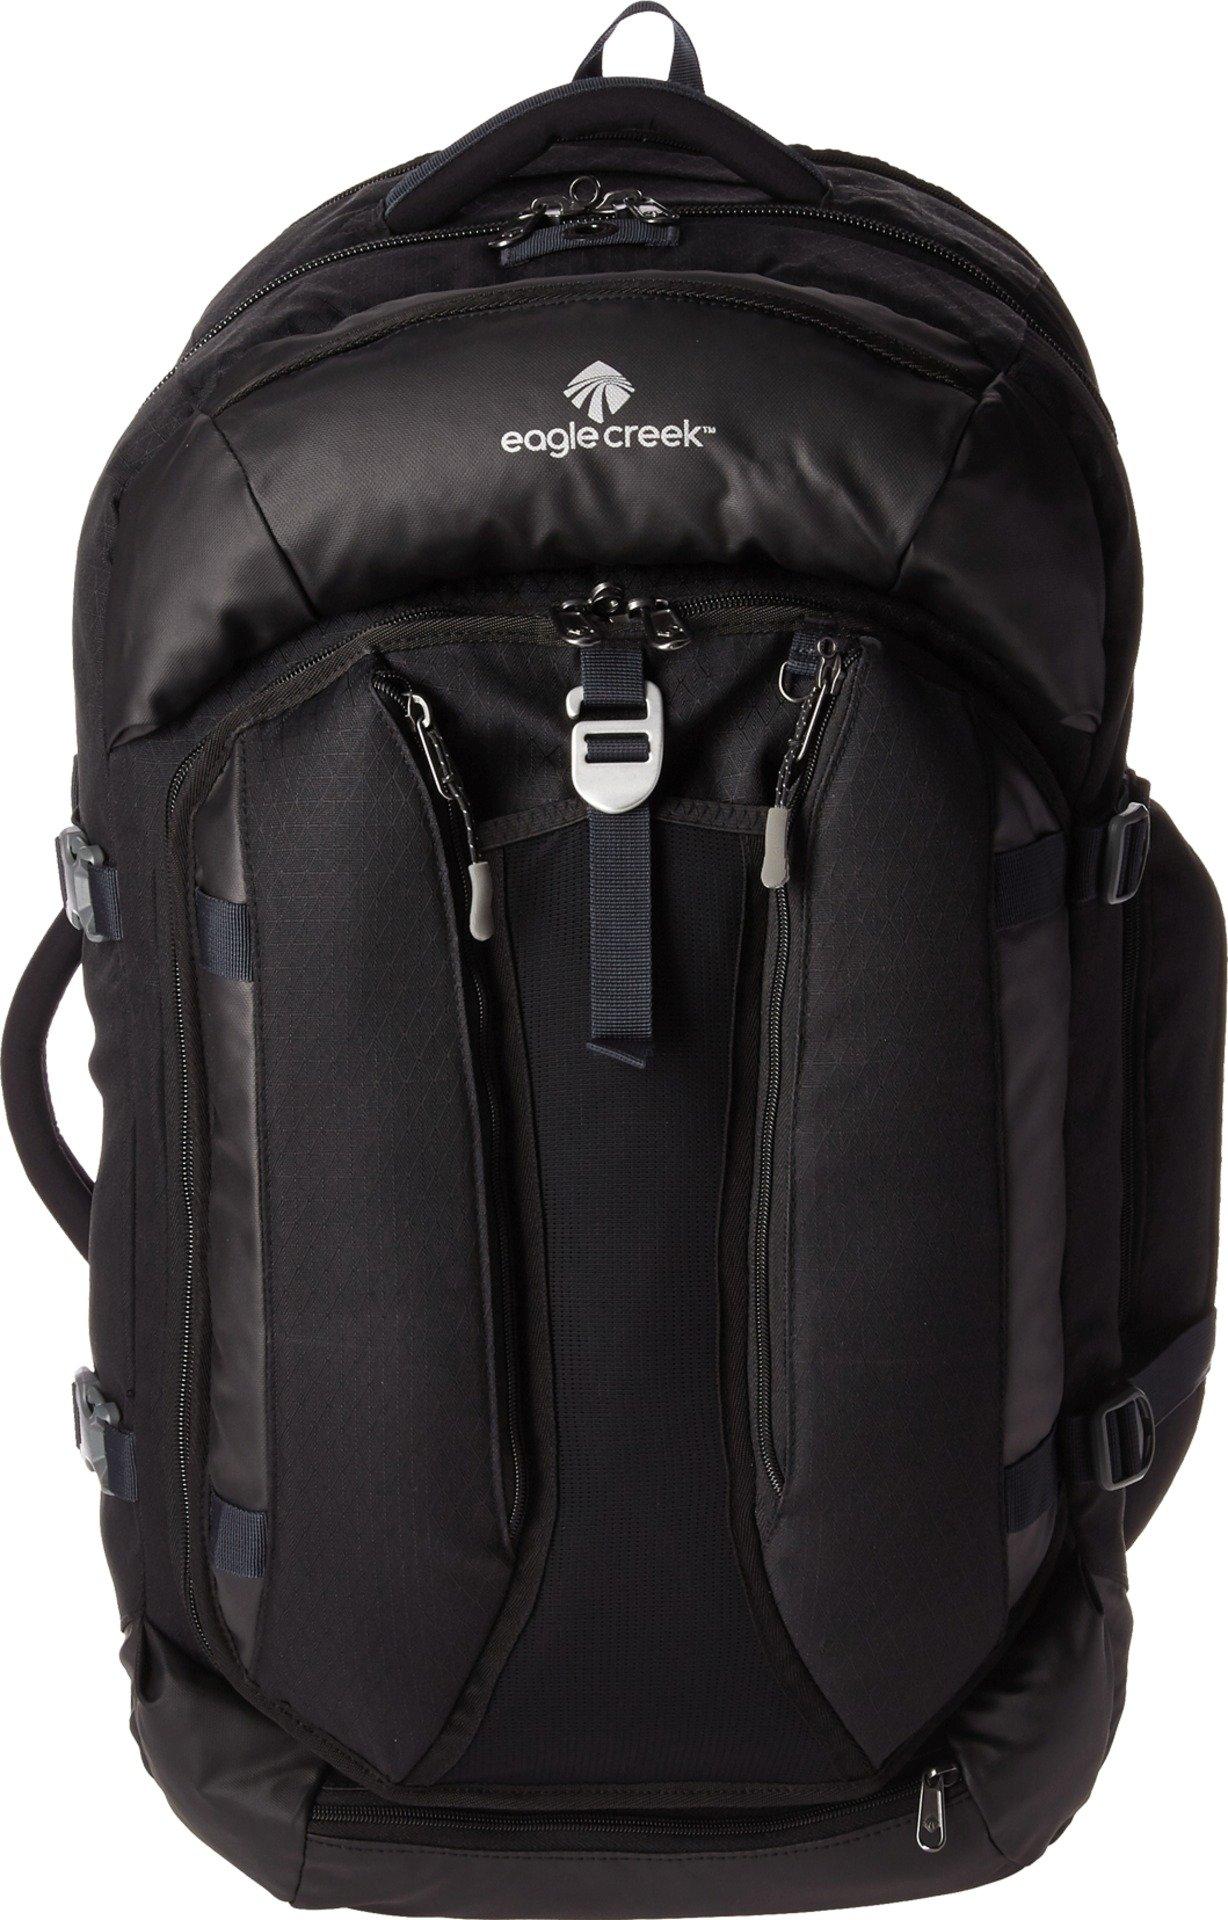 Eagle Creek Unisex Global Companion Travel Packs 65L Black One Size